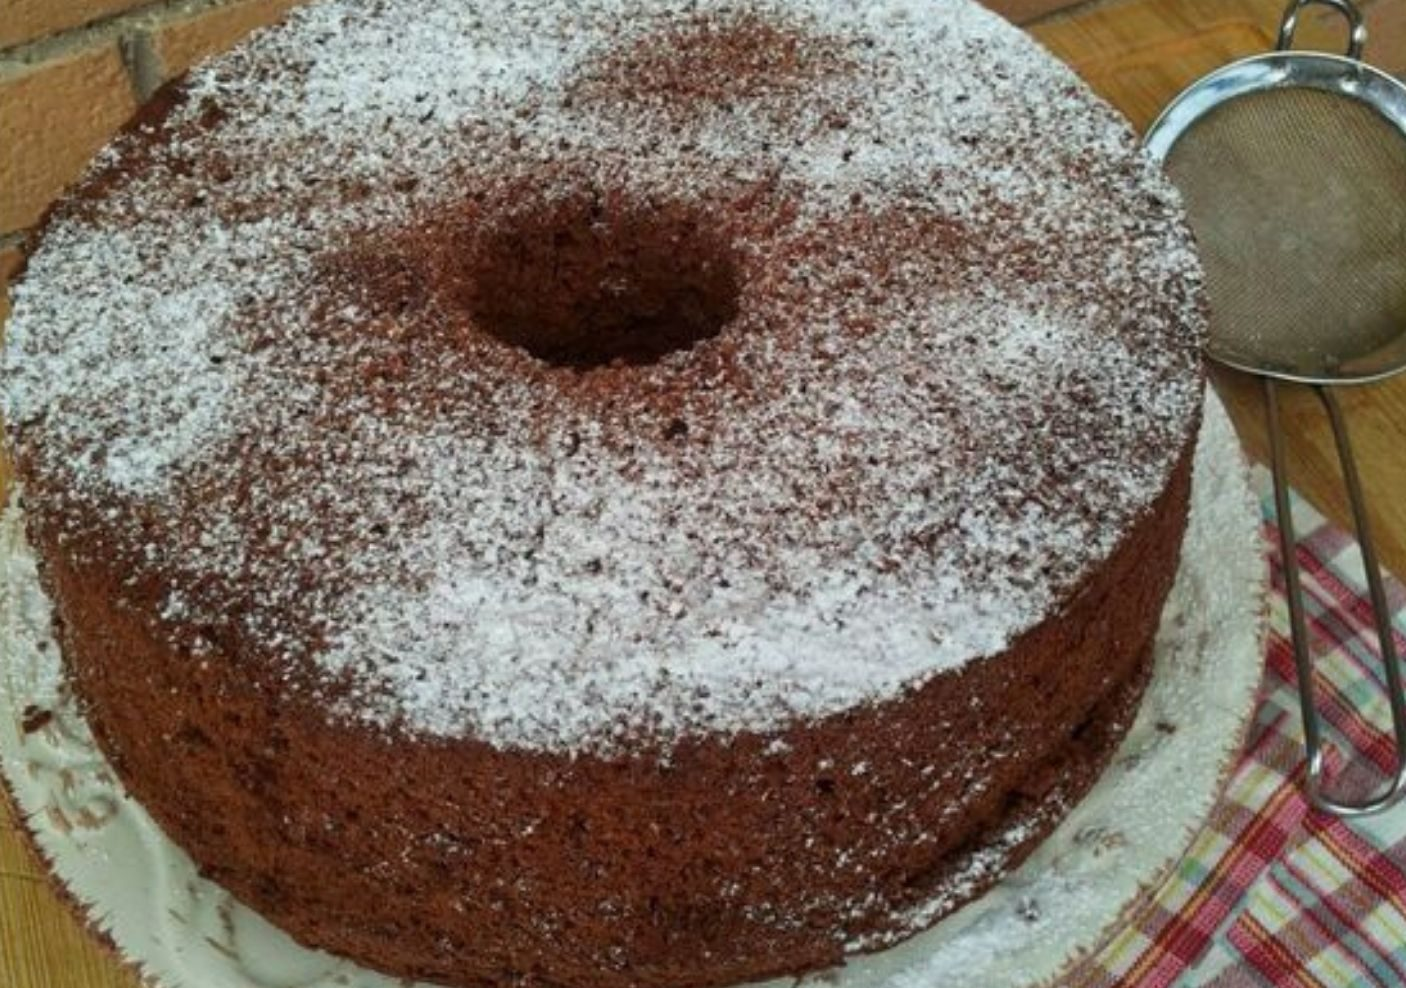 Torta al cioccolato con cremor tartaro